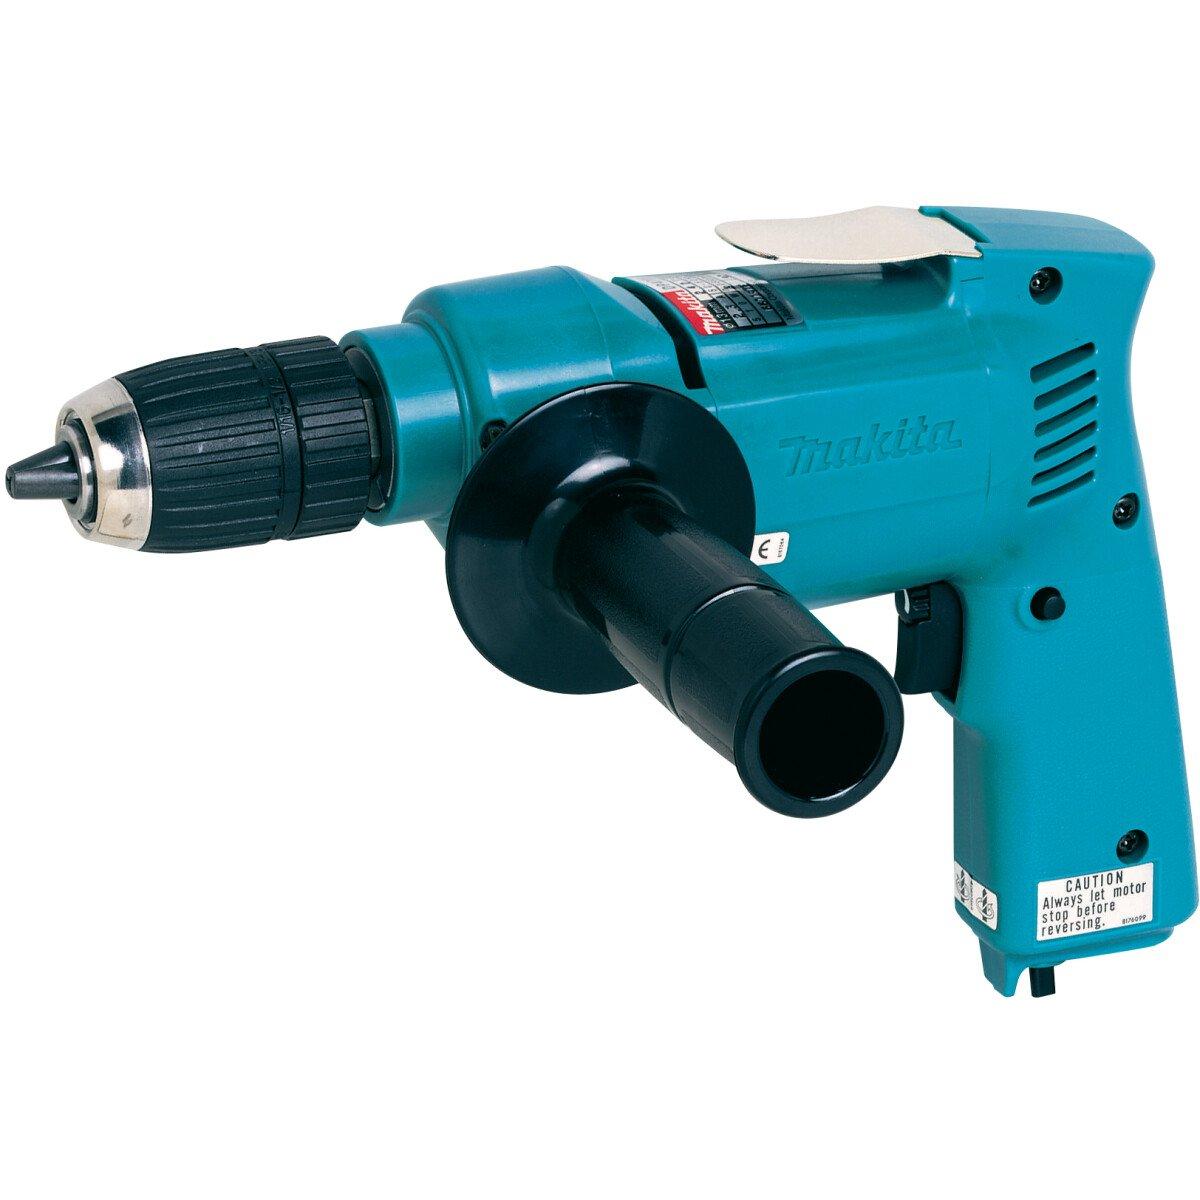 Makita DP4700 510W 13mm Rotary Drill DP4700